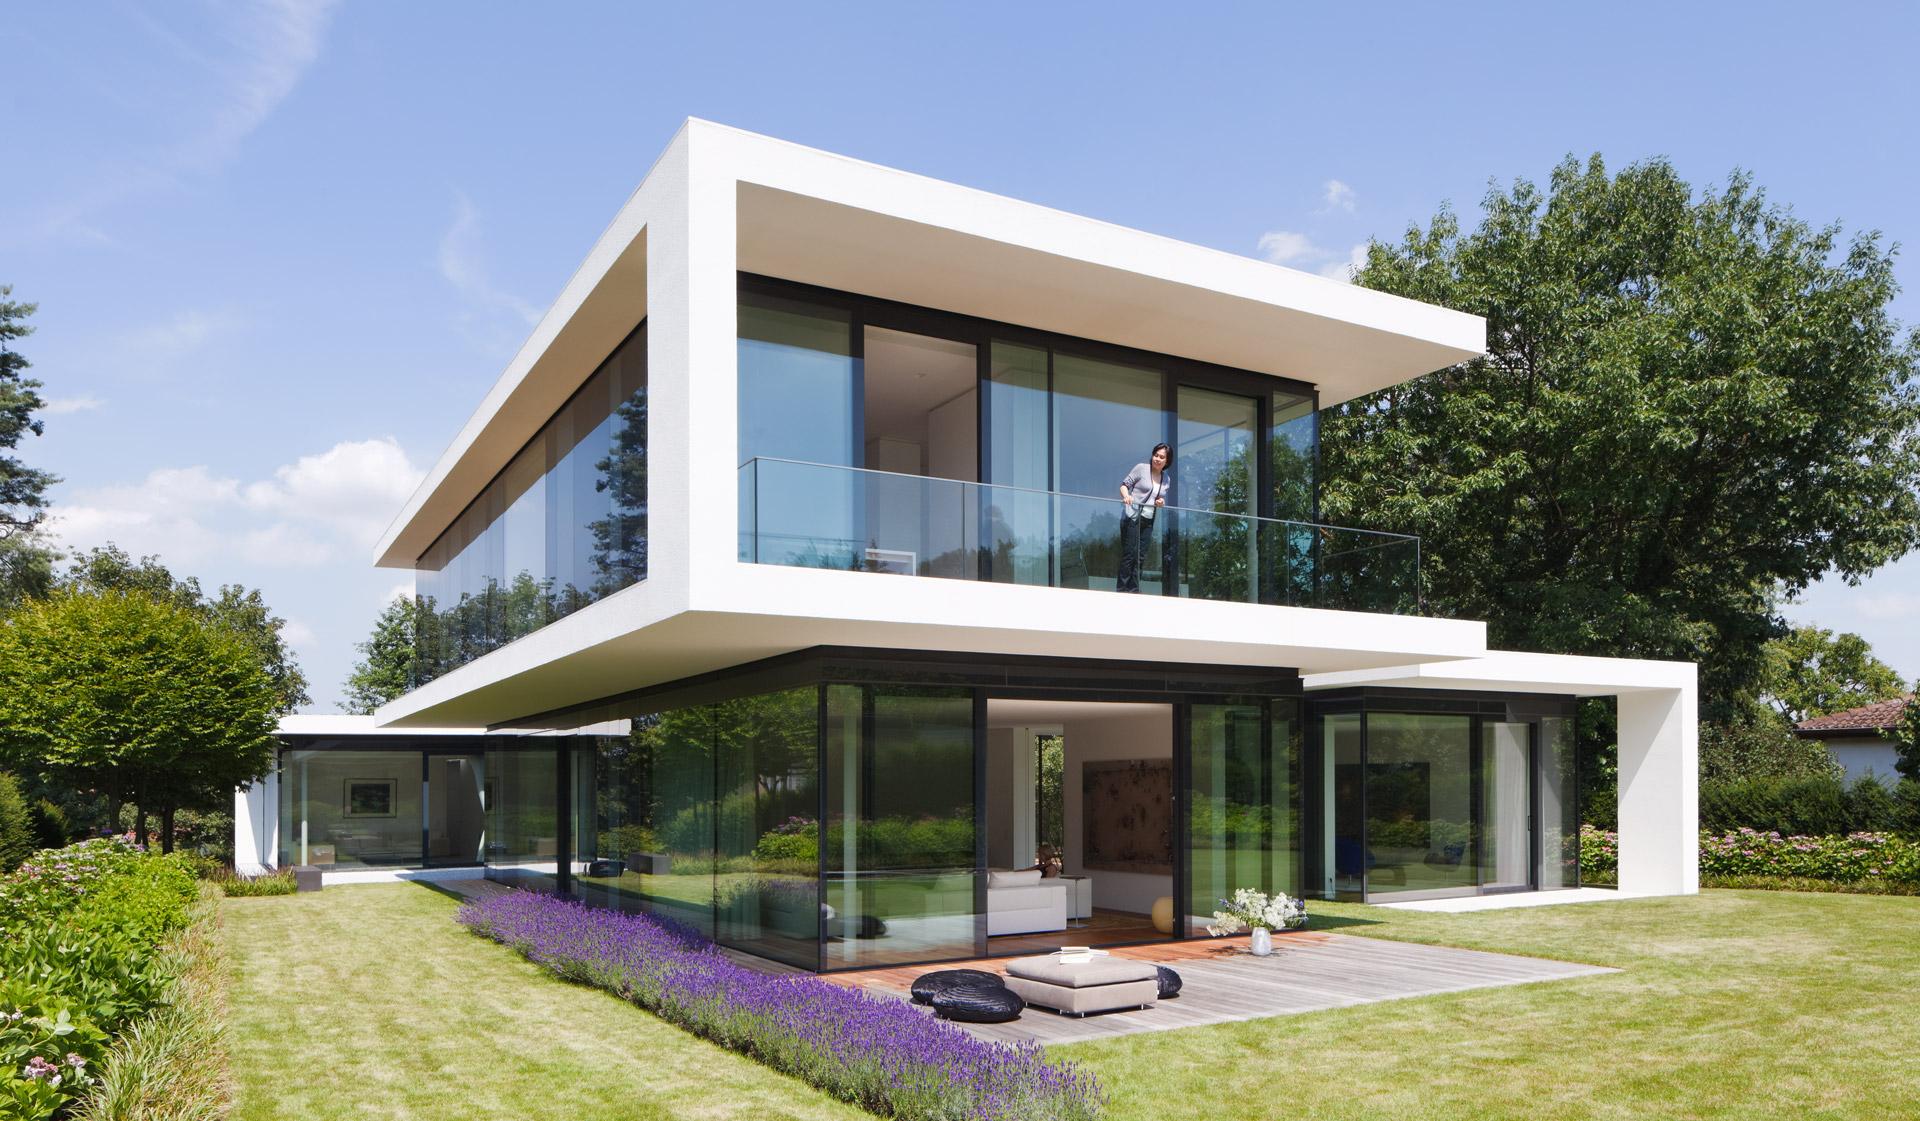 PavillonVilla in Bayern Weber Hummel Architekten 1